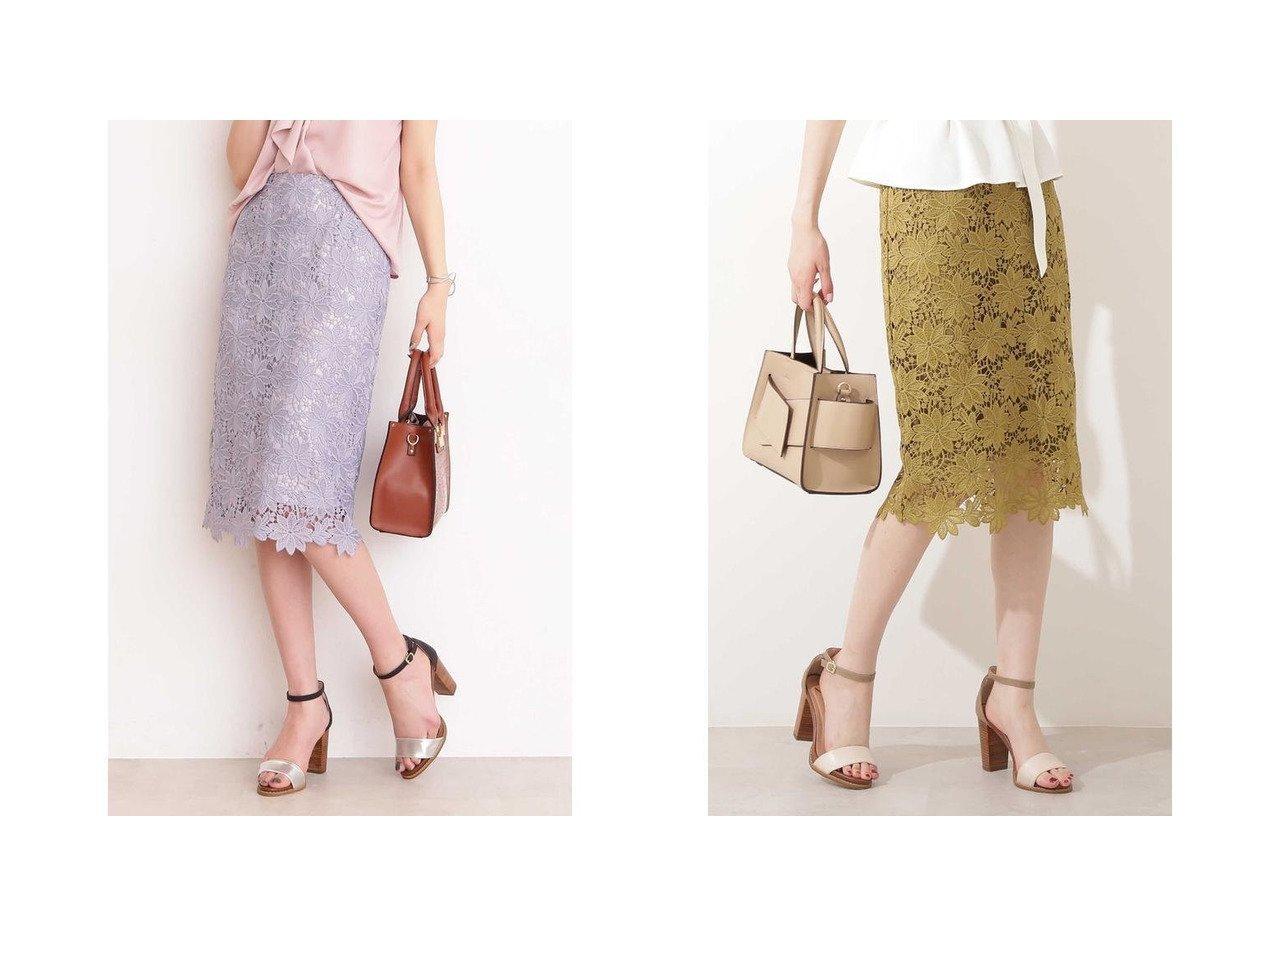 【N.Natural Beauty basic/エヌ ナチュラルビューティーベーシック】のケミカルレースタイトスカート NATURAL BEAUTY BASICのおすすめ!人気、トレンド・レディースファッションの通販 おすすめで人気の流行・トレンド、ファッションの通販商品 メンズファッション・キッズファッション・インテリア・家具・レディースファッション・服の通販 founy(ファニー) https://founy.com/ ファッション Fashion レディースファッション WOMEN スカート Skirt カットソー ケミカル シンプル スカラップ ストレート タイトスカート フェミニン レース 人気 定番 Standard |ID:crp329100000018039